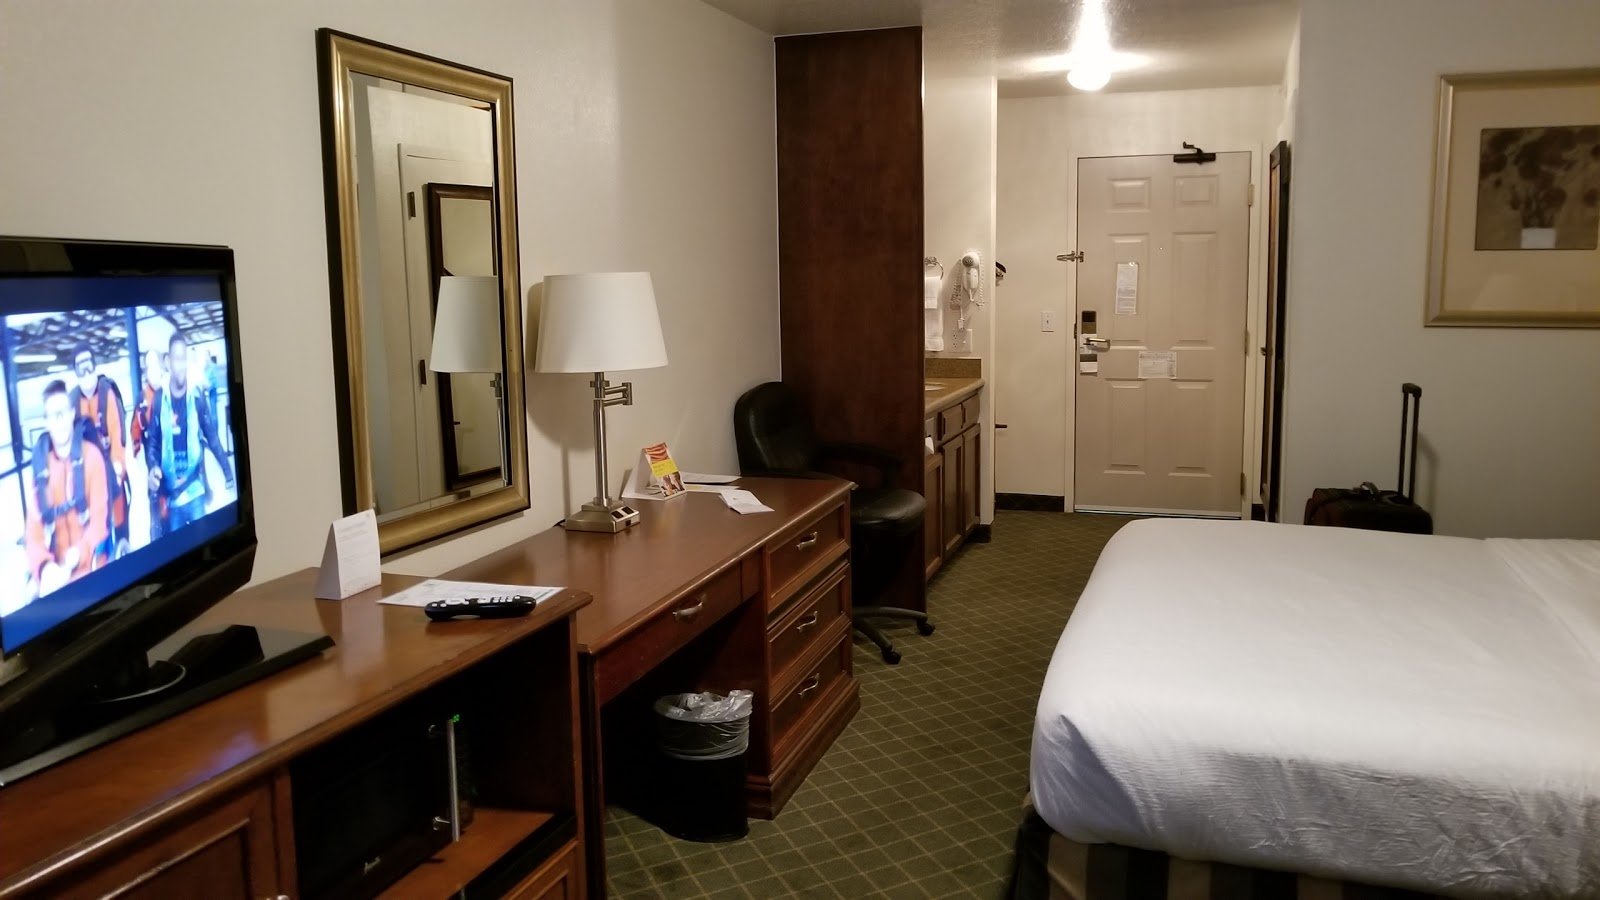 Holiday Inn and Convention Center Map - Redding, California - Mapcarta